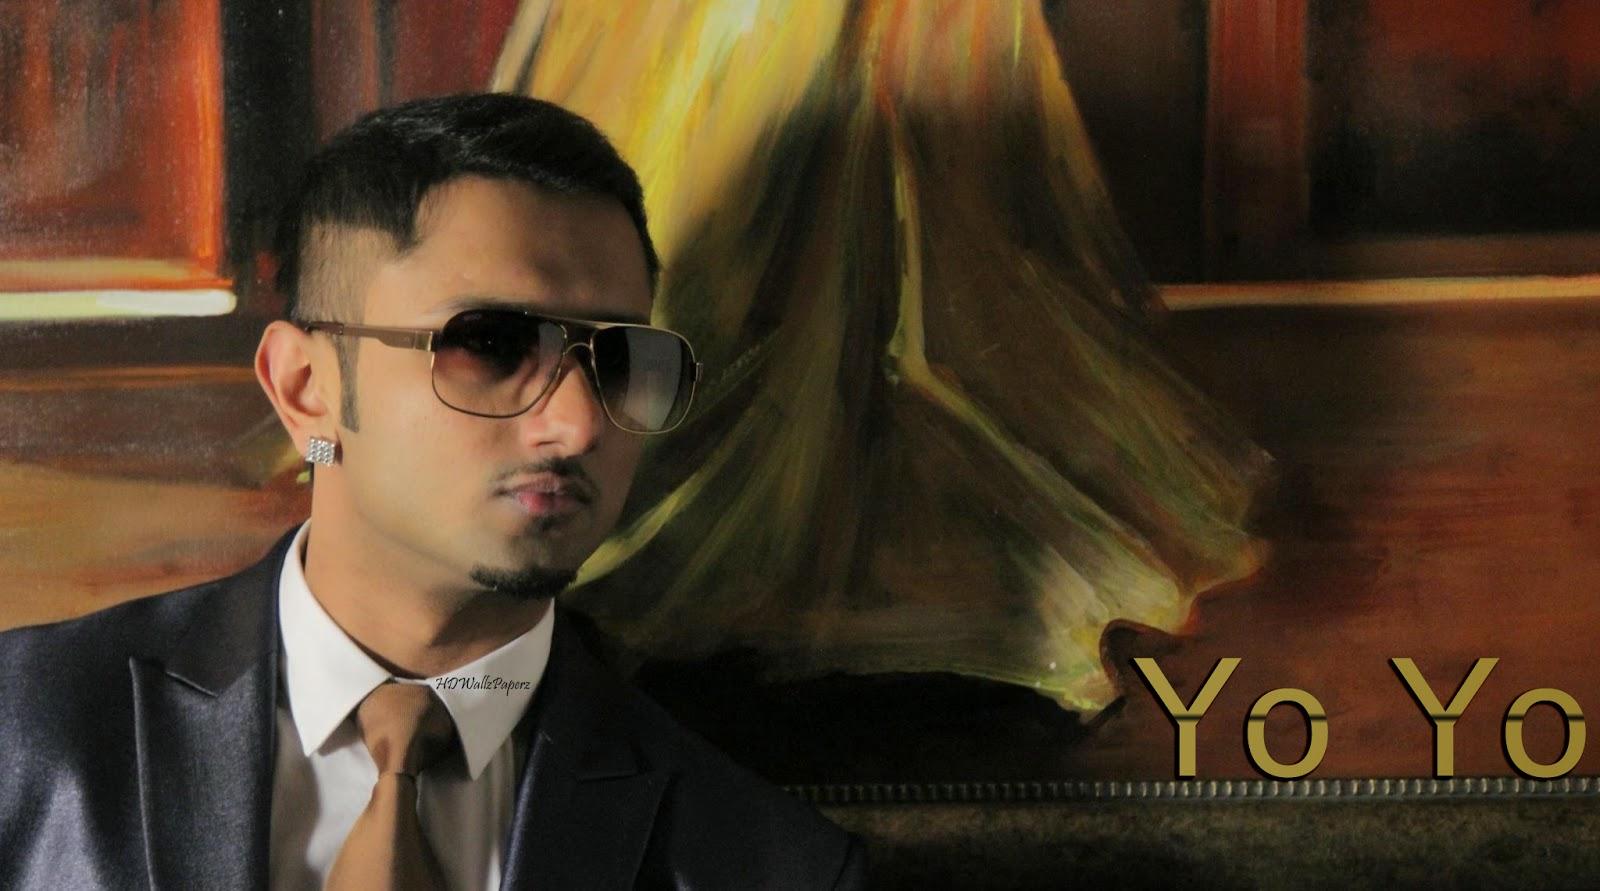 yo yo honey singjh Manali trance official video yo yo honey singh & neha kakkar the shaukeens lisa haydon you tube.